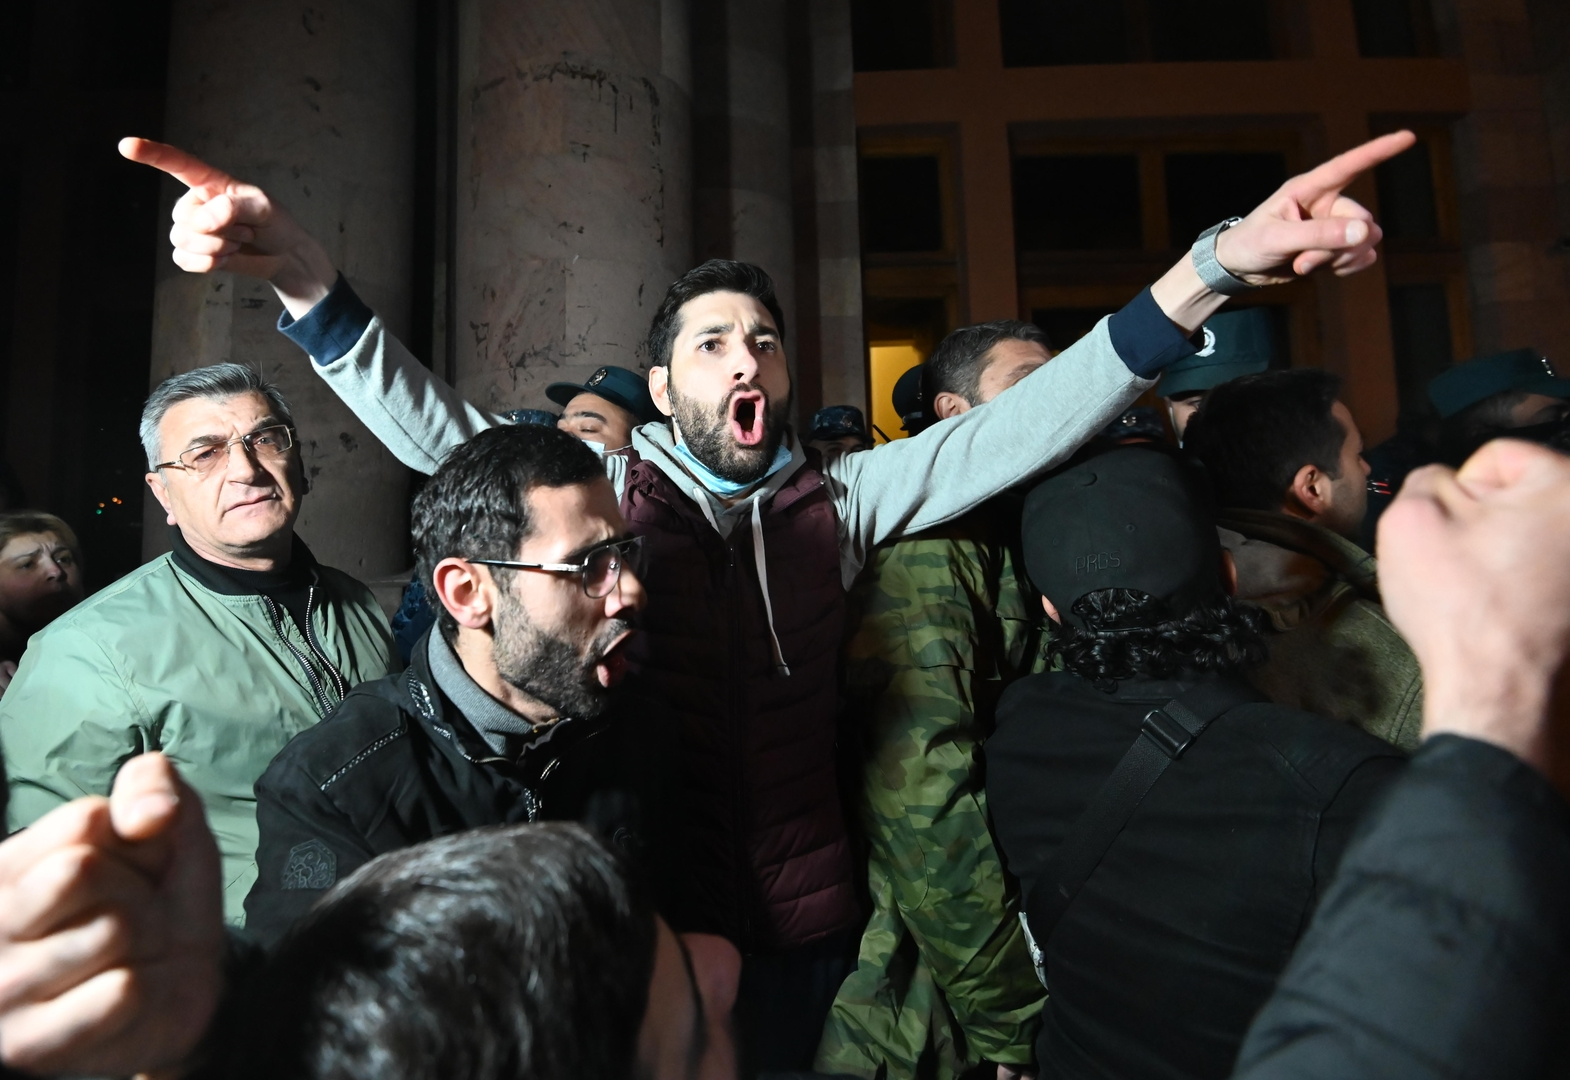 Demonstranten vor dem armenischen Parlamentsgebäude in Jerewan. 10. November 2020